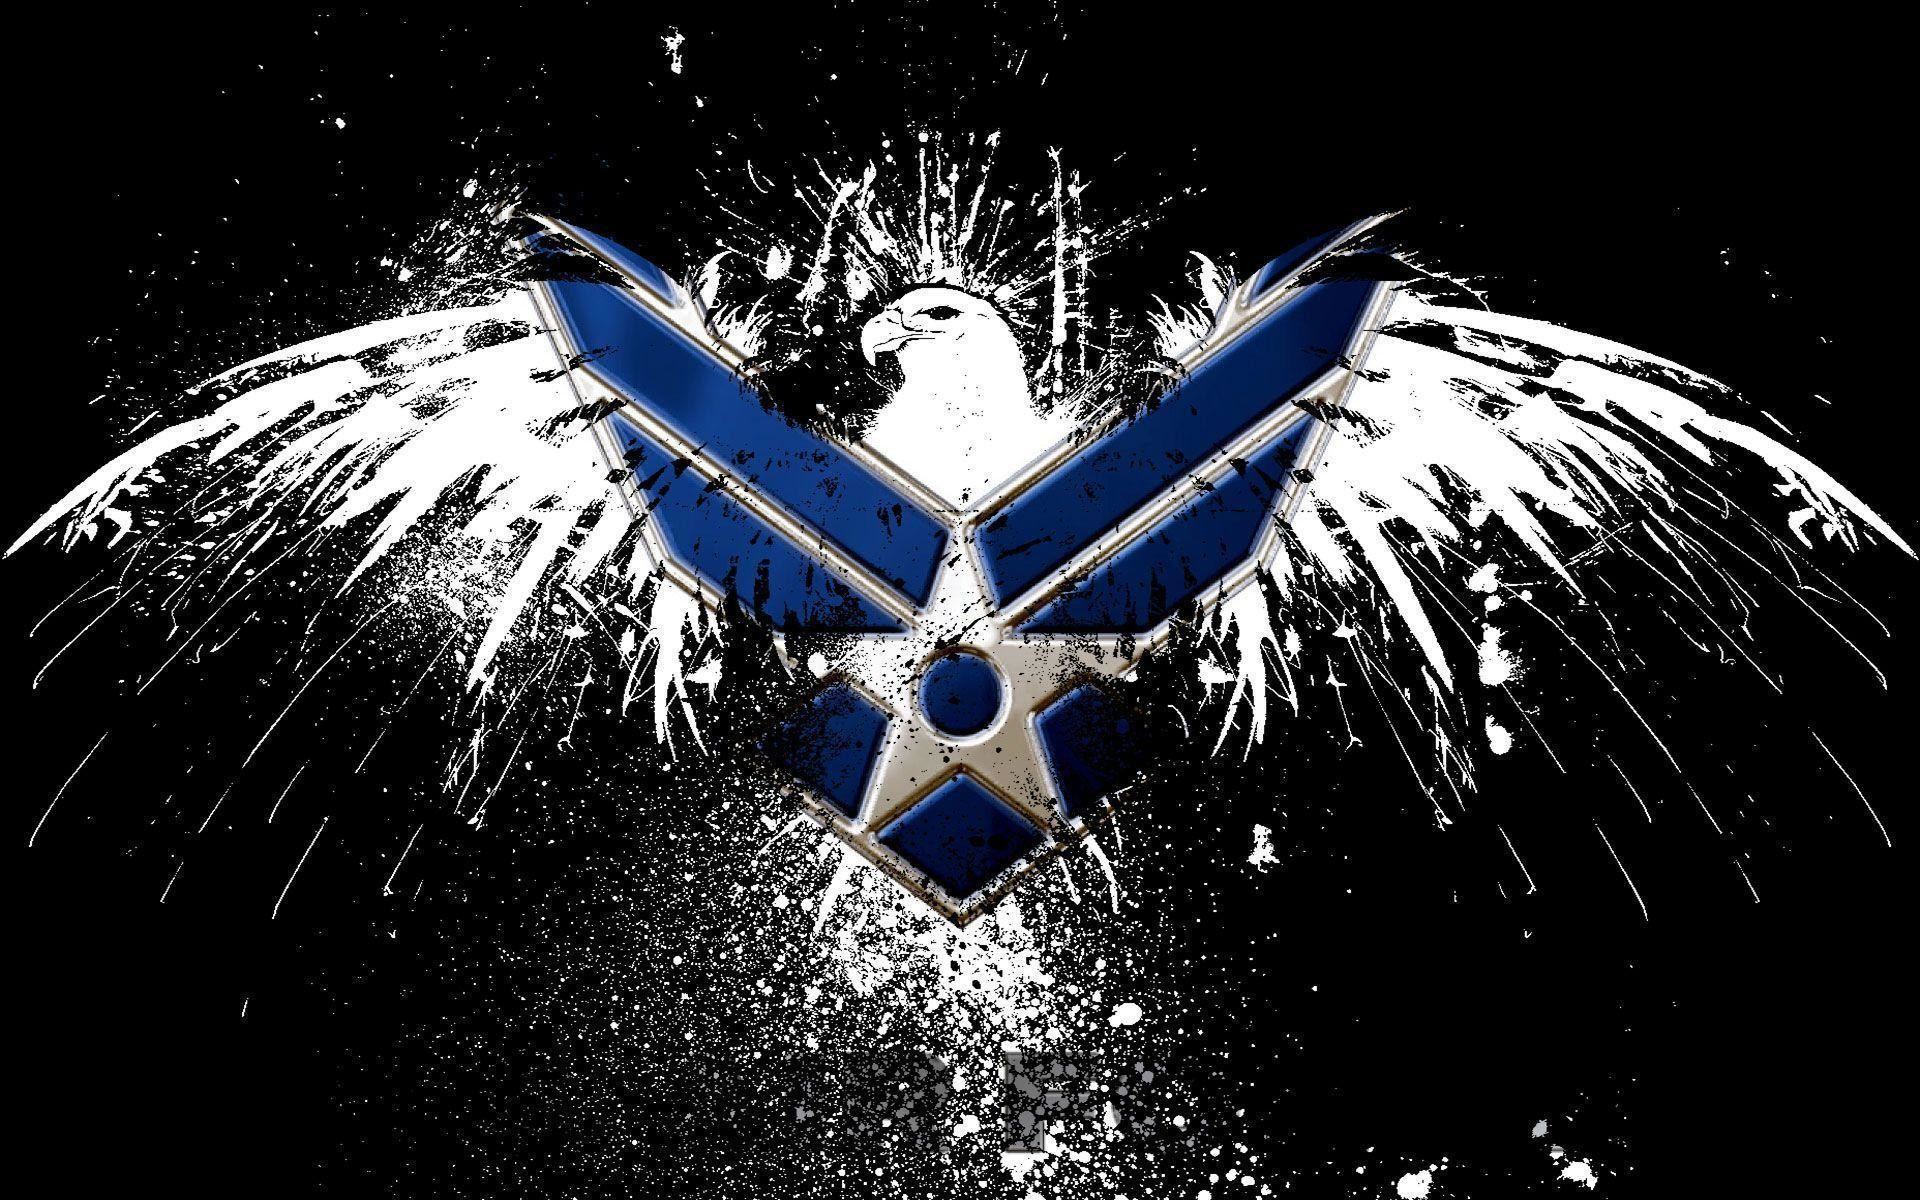 air force nike iphone wallpaper hd